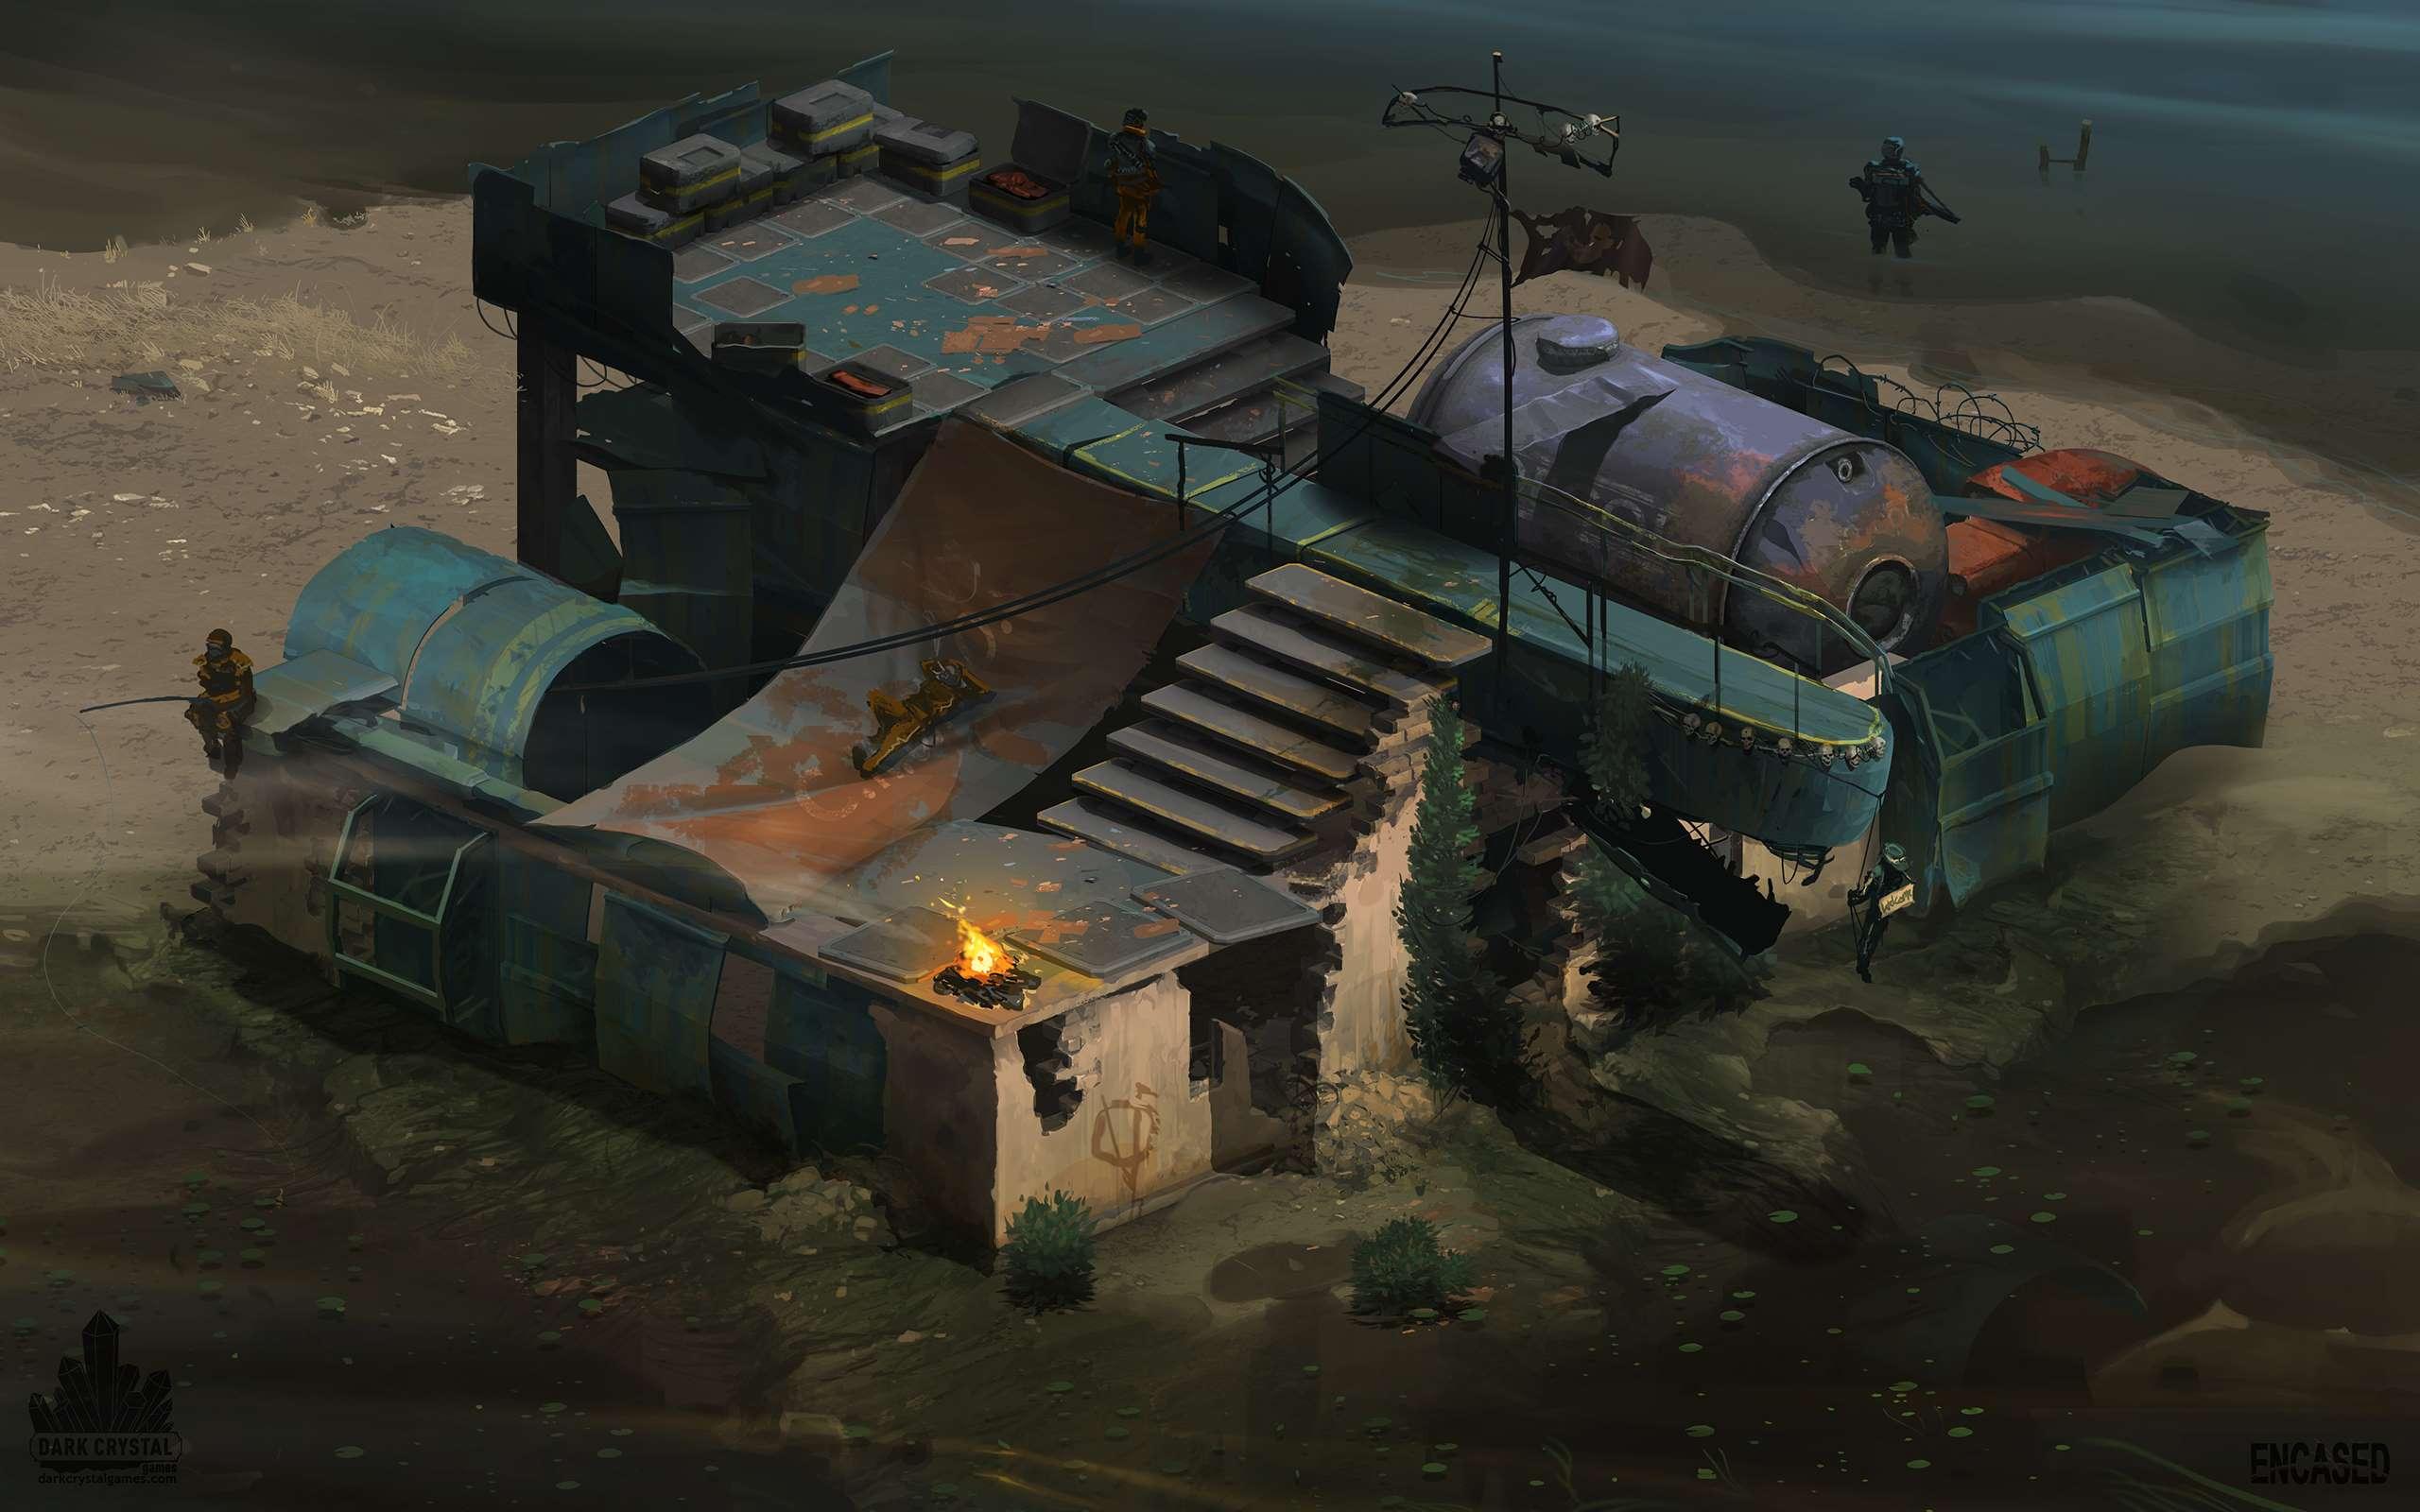 Raiders_Camp | The Dark Lot / Hospital Bed / Crumbling Towers / Scrollonoid / Redeemer | В разработке #91